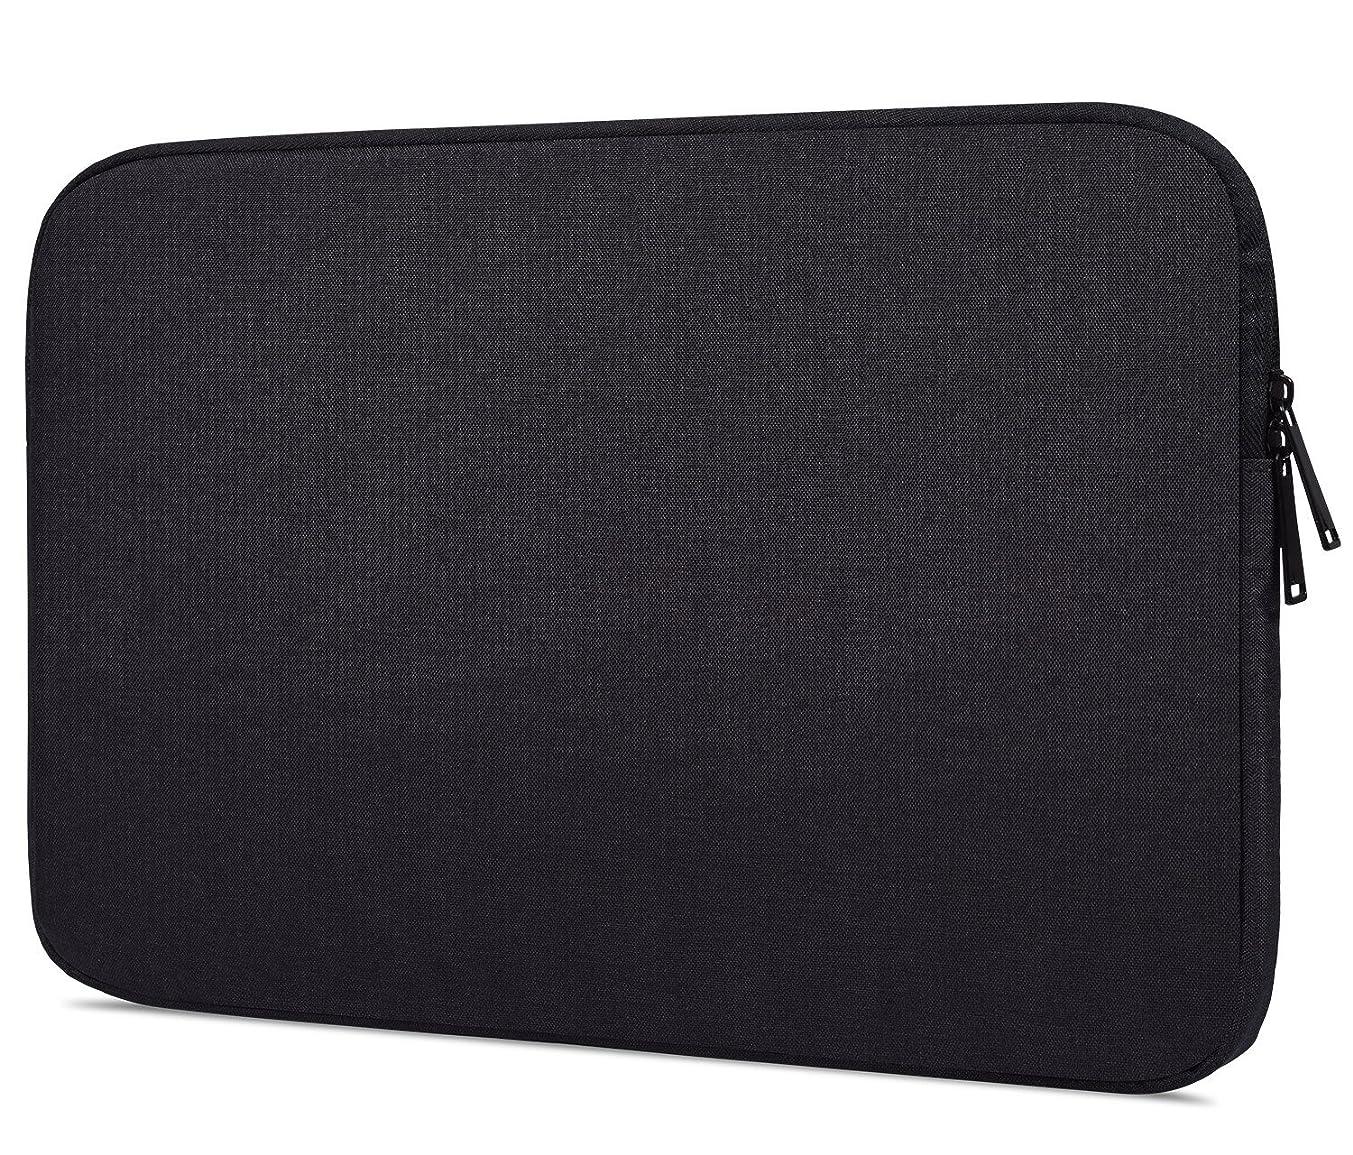 14-15 Inch Water Resistant Laptop Sleeve Bag Compatible Acer Chromebook 14,Asus VivoBook 14/ASUS L402WA 14